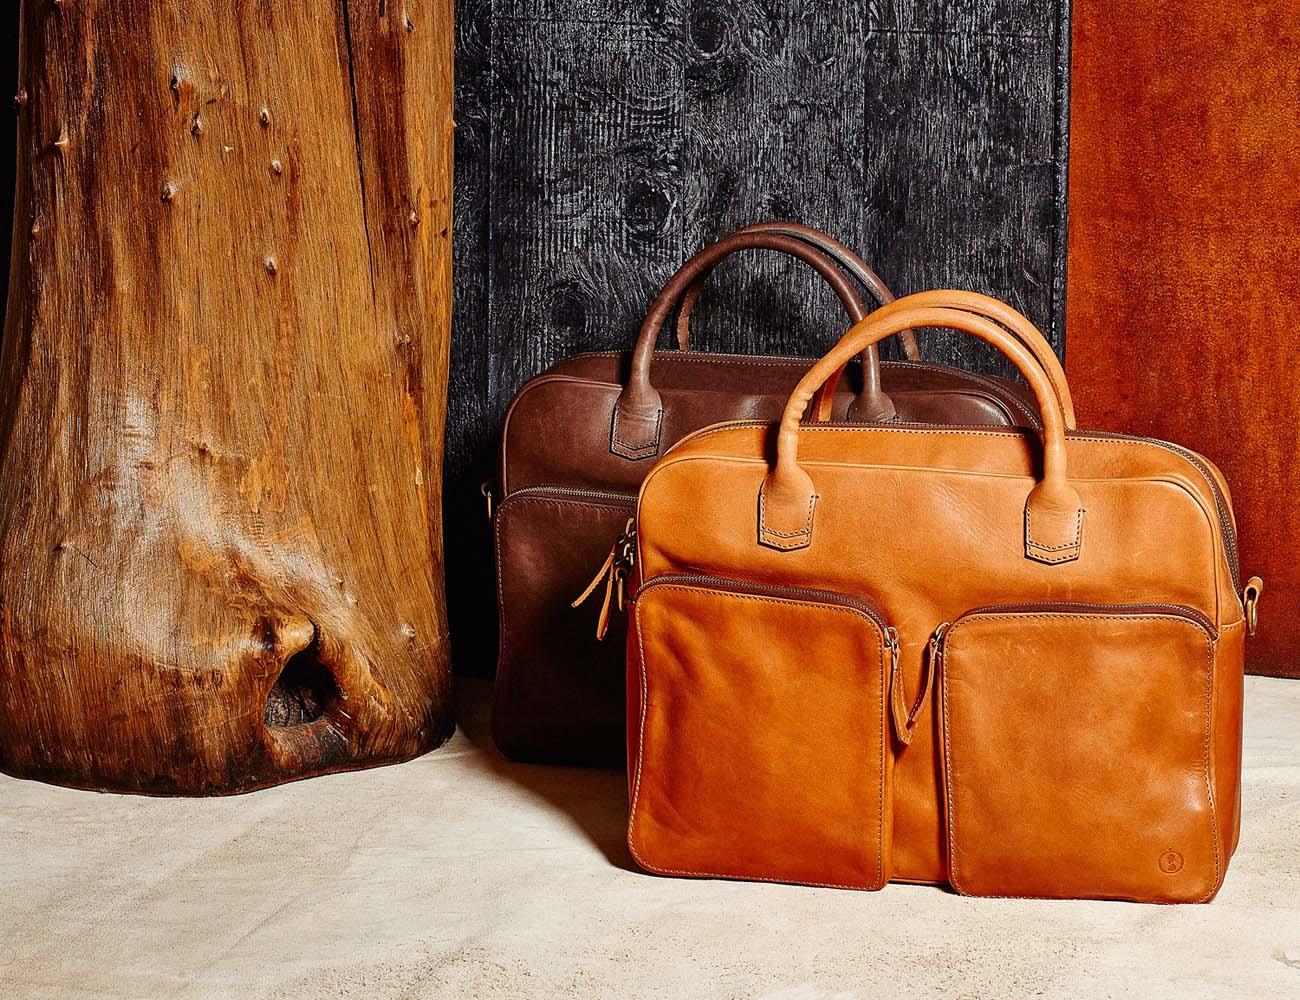 Portage+Briefcase+By+Libero+Ferrero